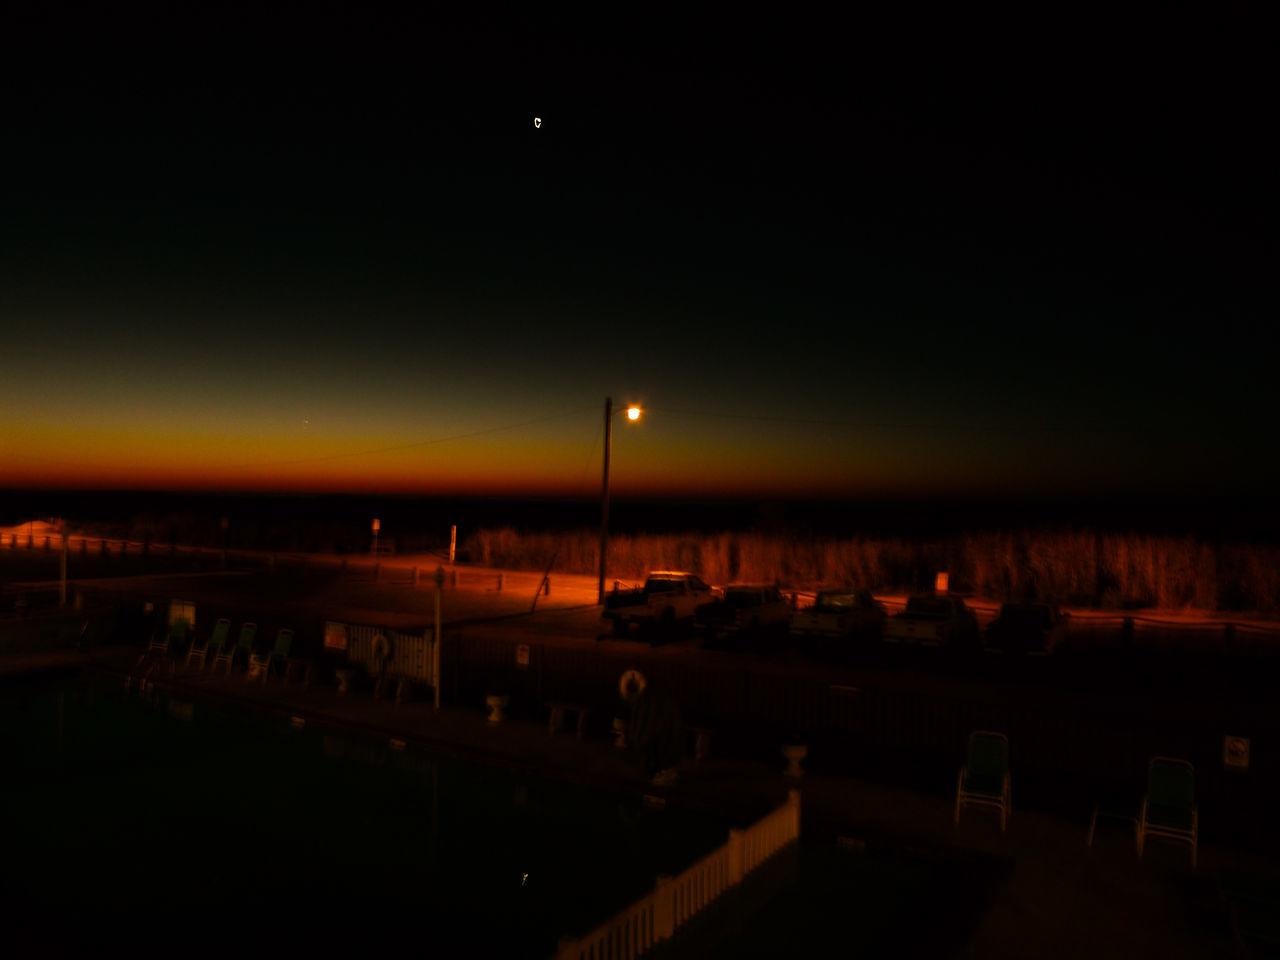 Dark Illuminated Morning Star Night Ocan Venus Rising Sky Sunrise Beach Sunrise Silhouette